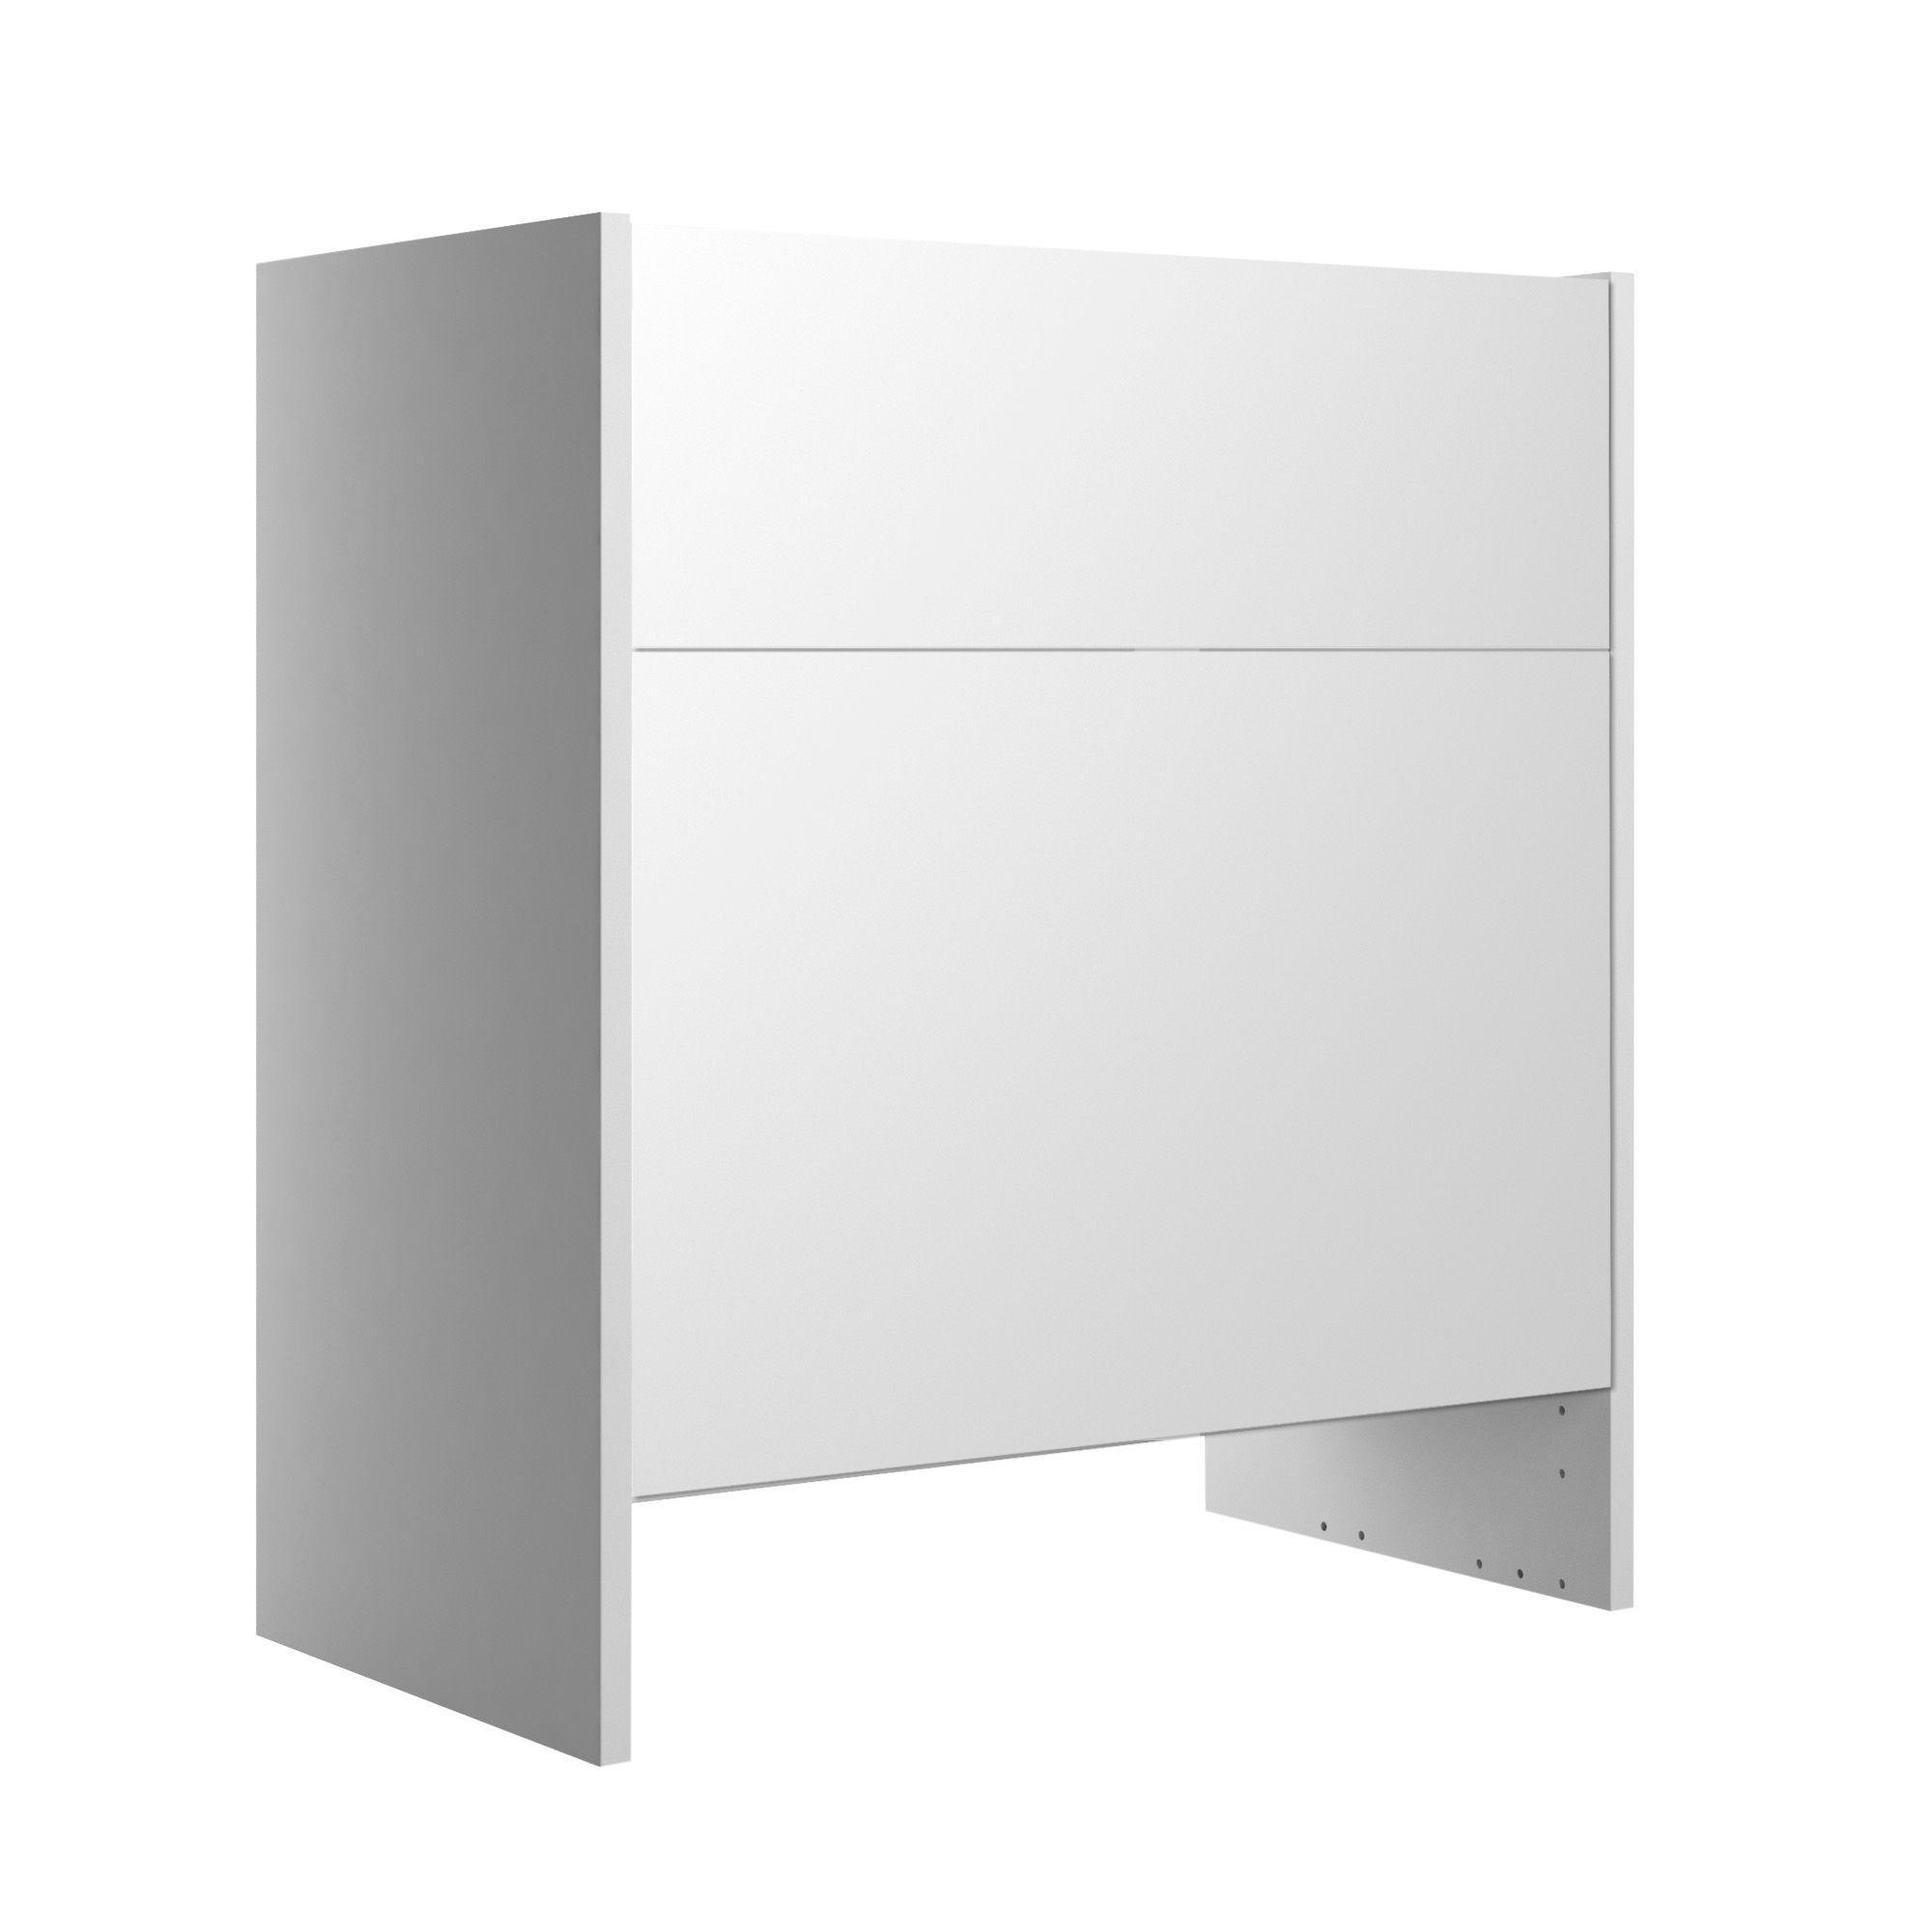 Cooke & Lewis Marletti Gloss White Toilet Unit, (w)600mm